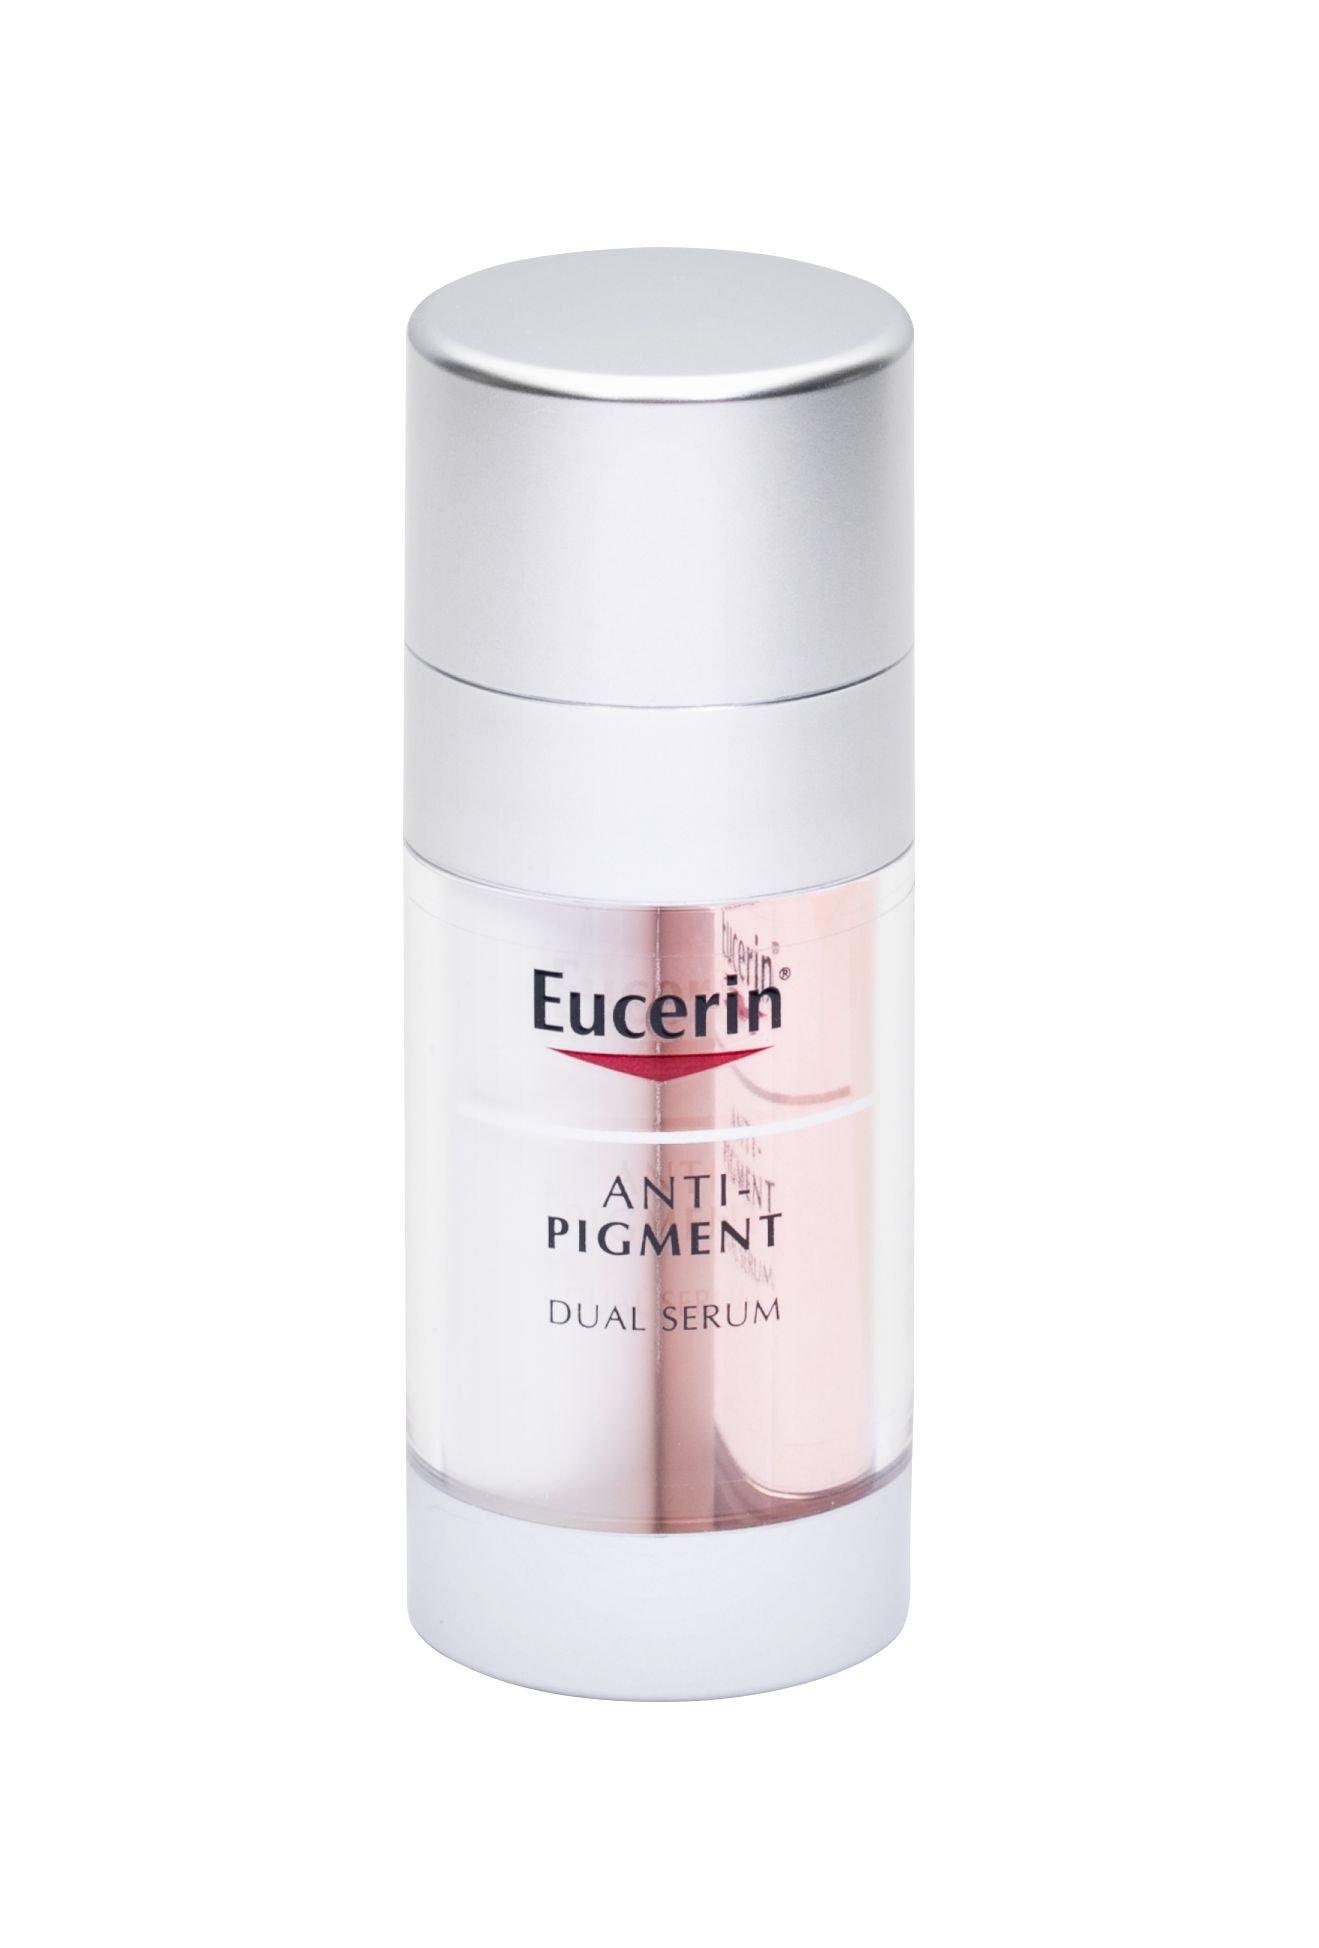 Eucerin Anti-Pigment Skin Serum 30ml